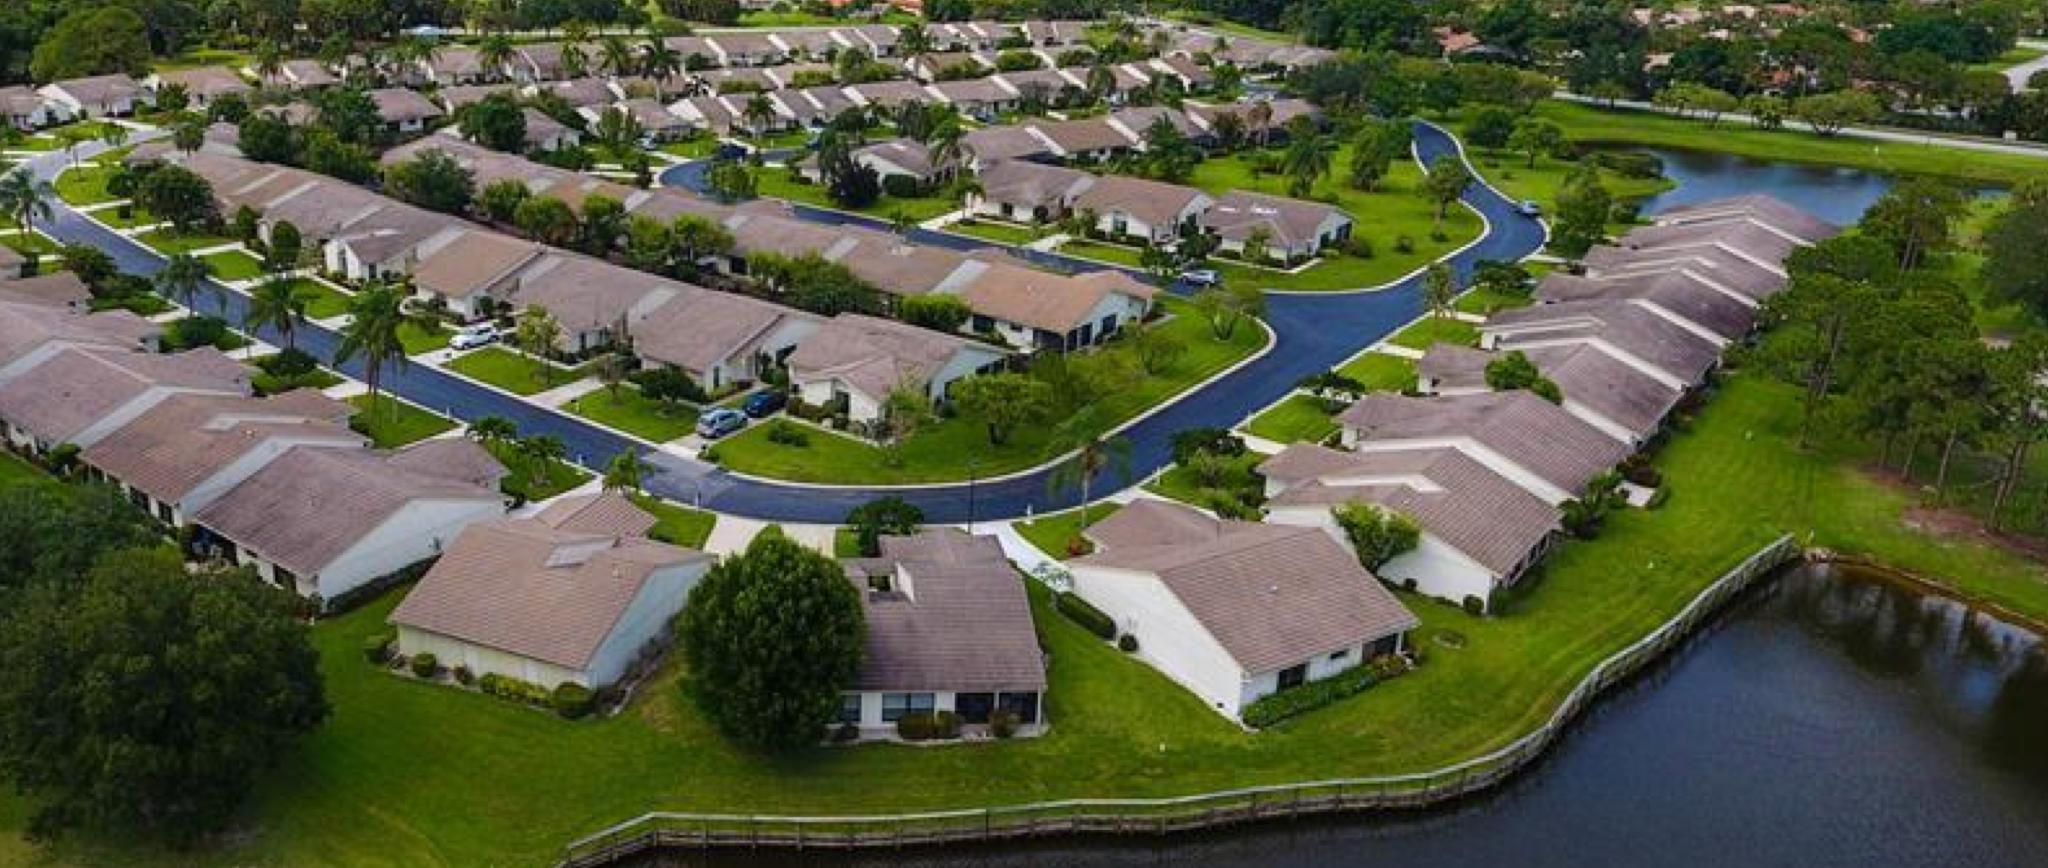 Egret Pond Palm City Aerial View